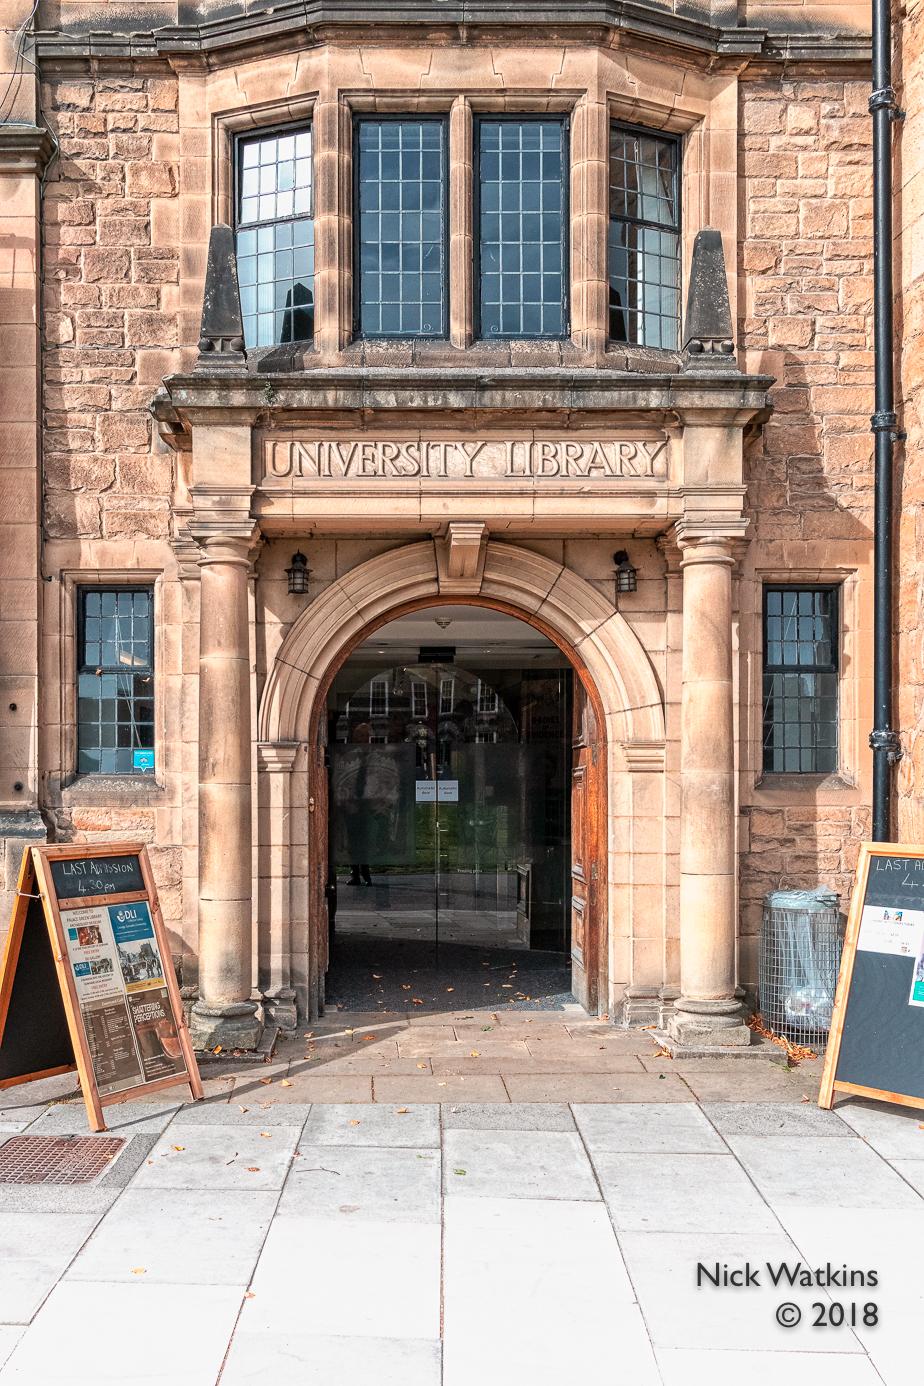 d32-Durham university library cw